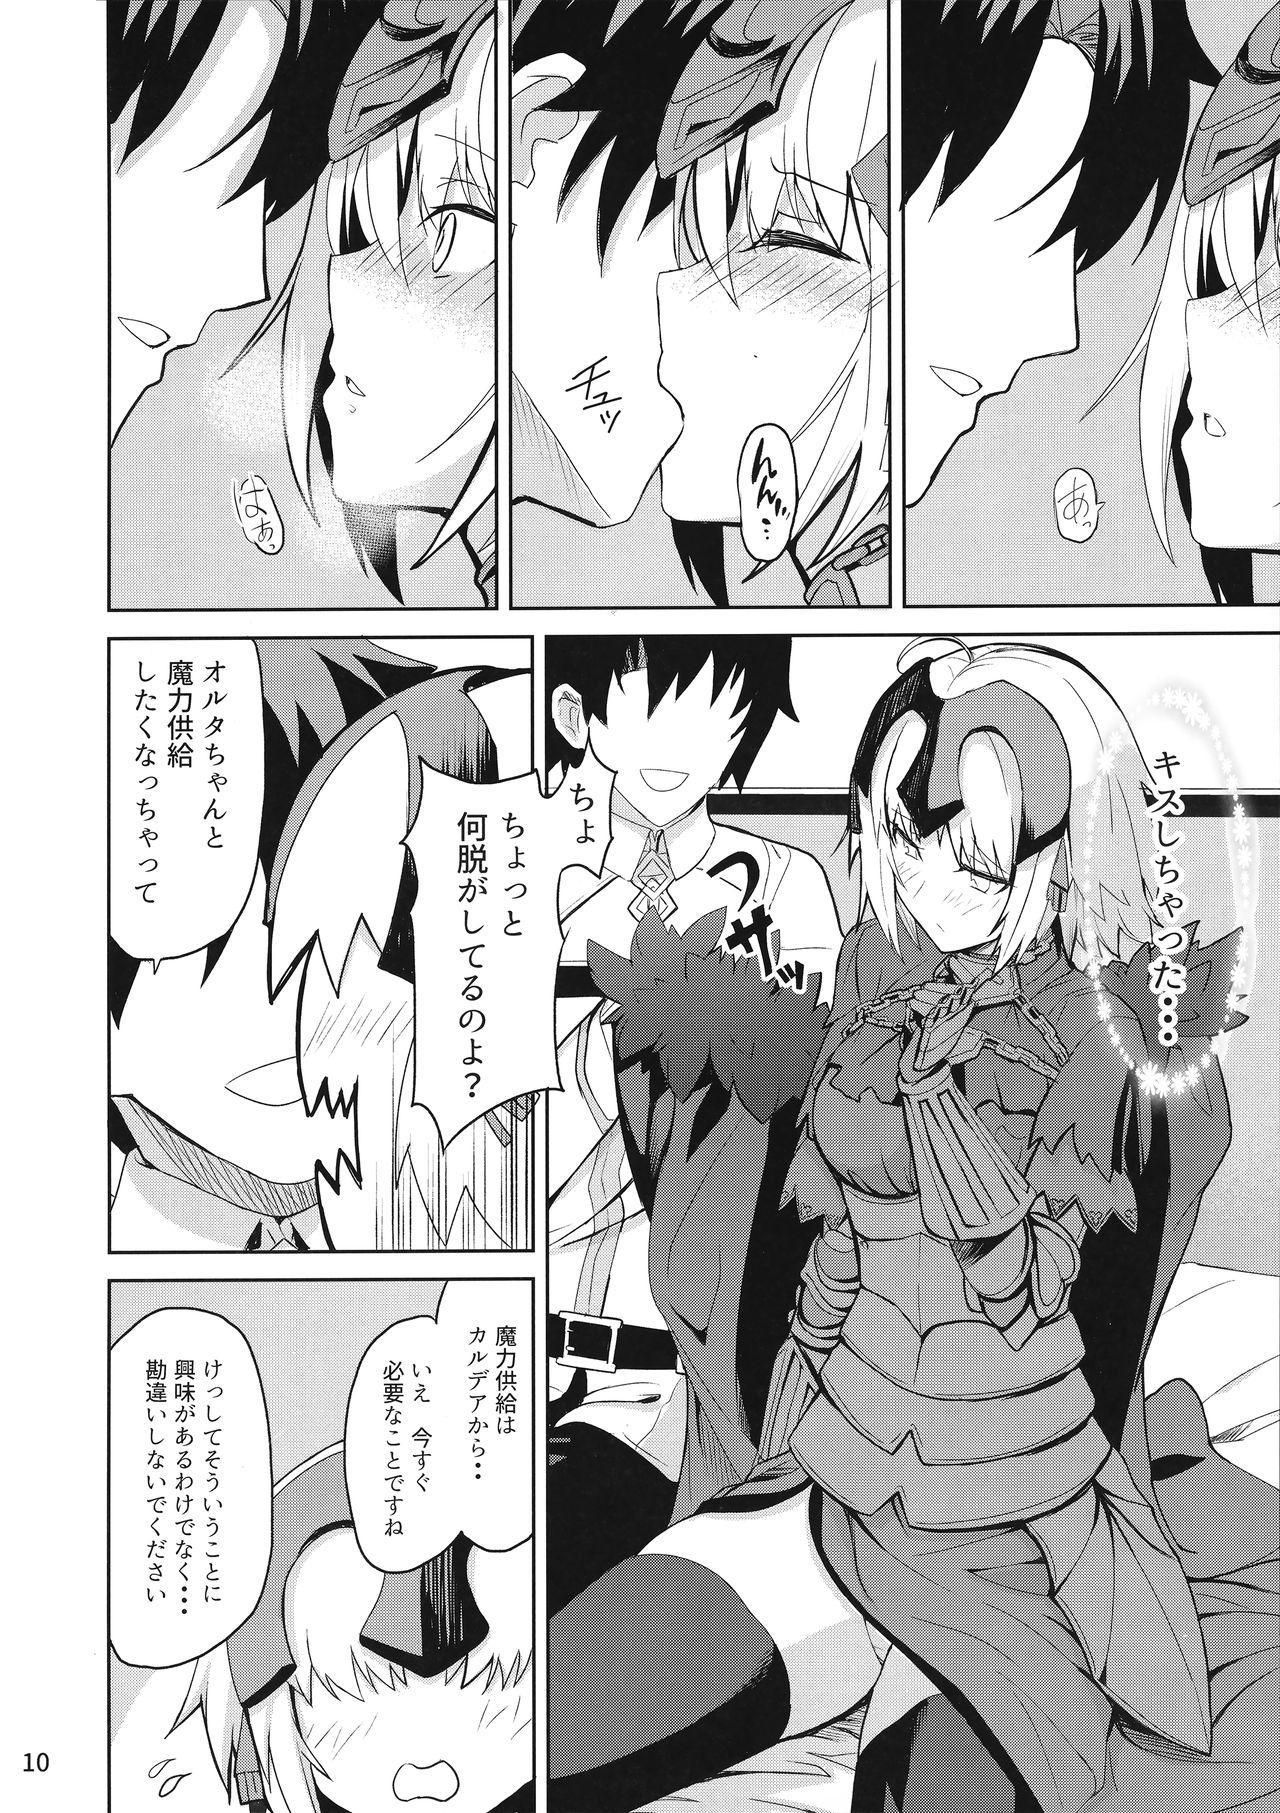 Tokimeki Avenger 8